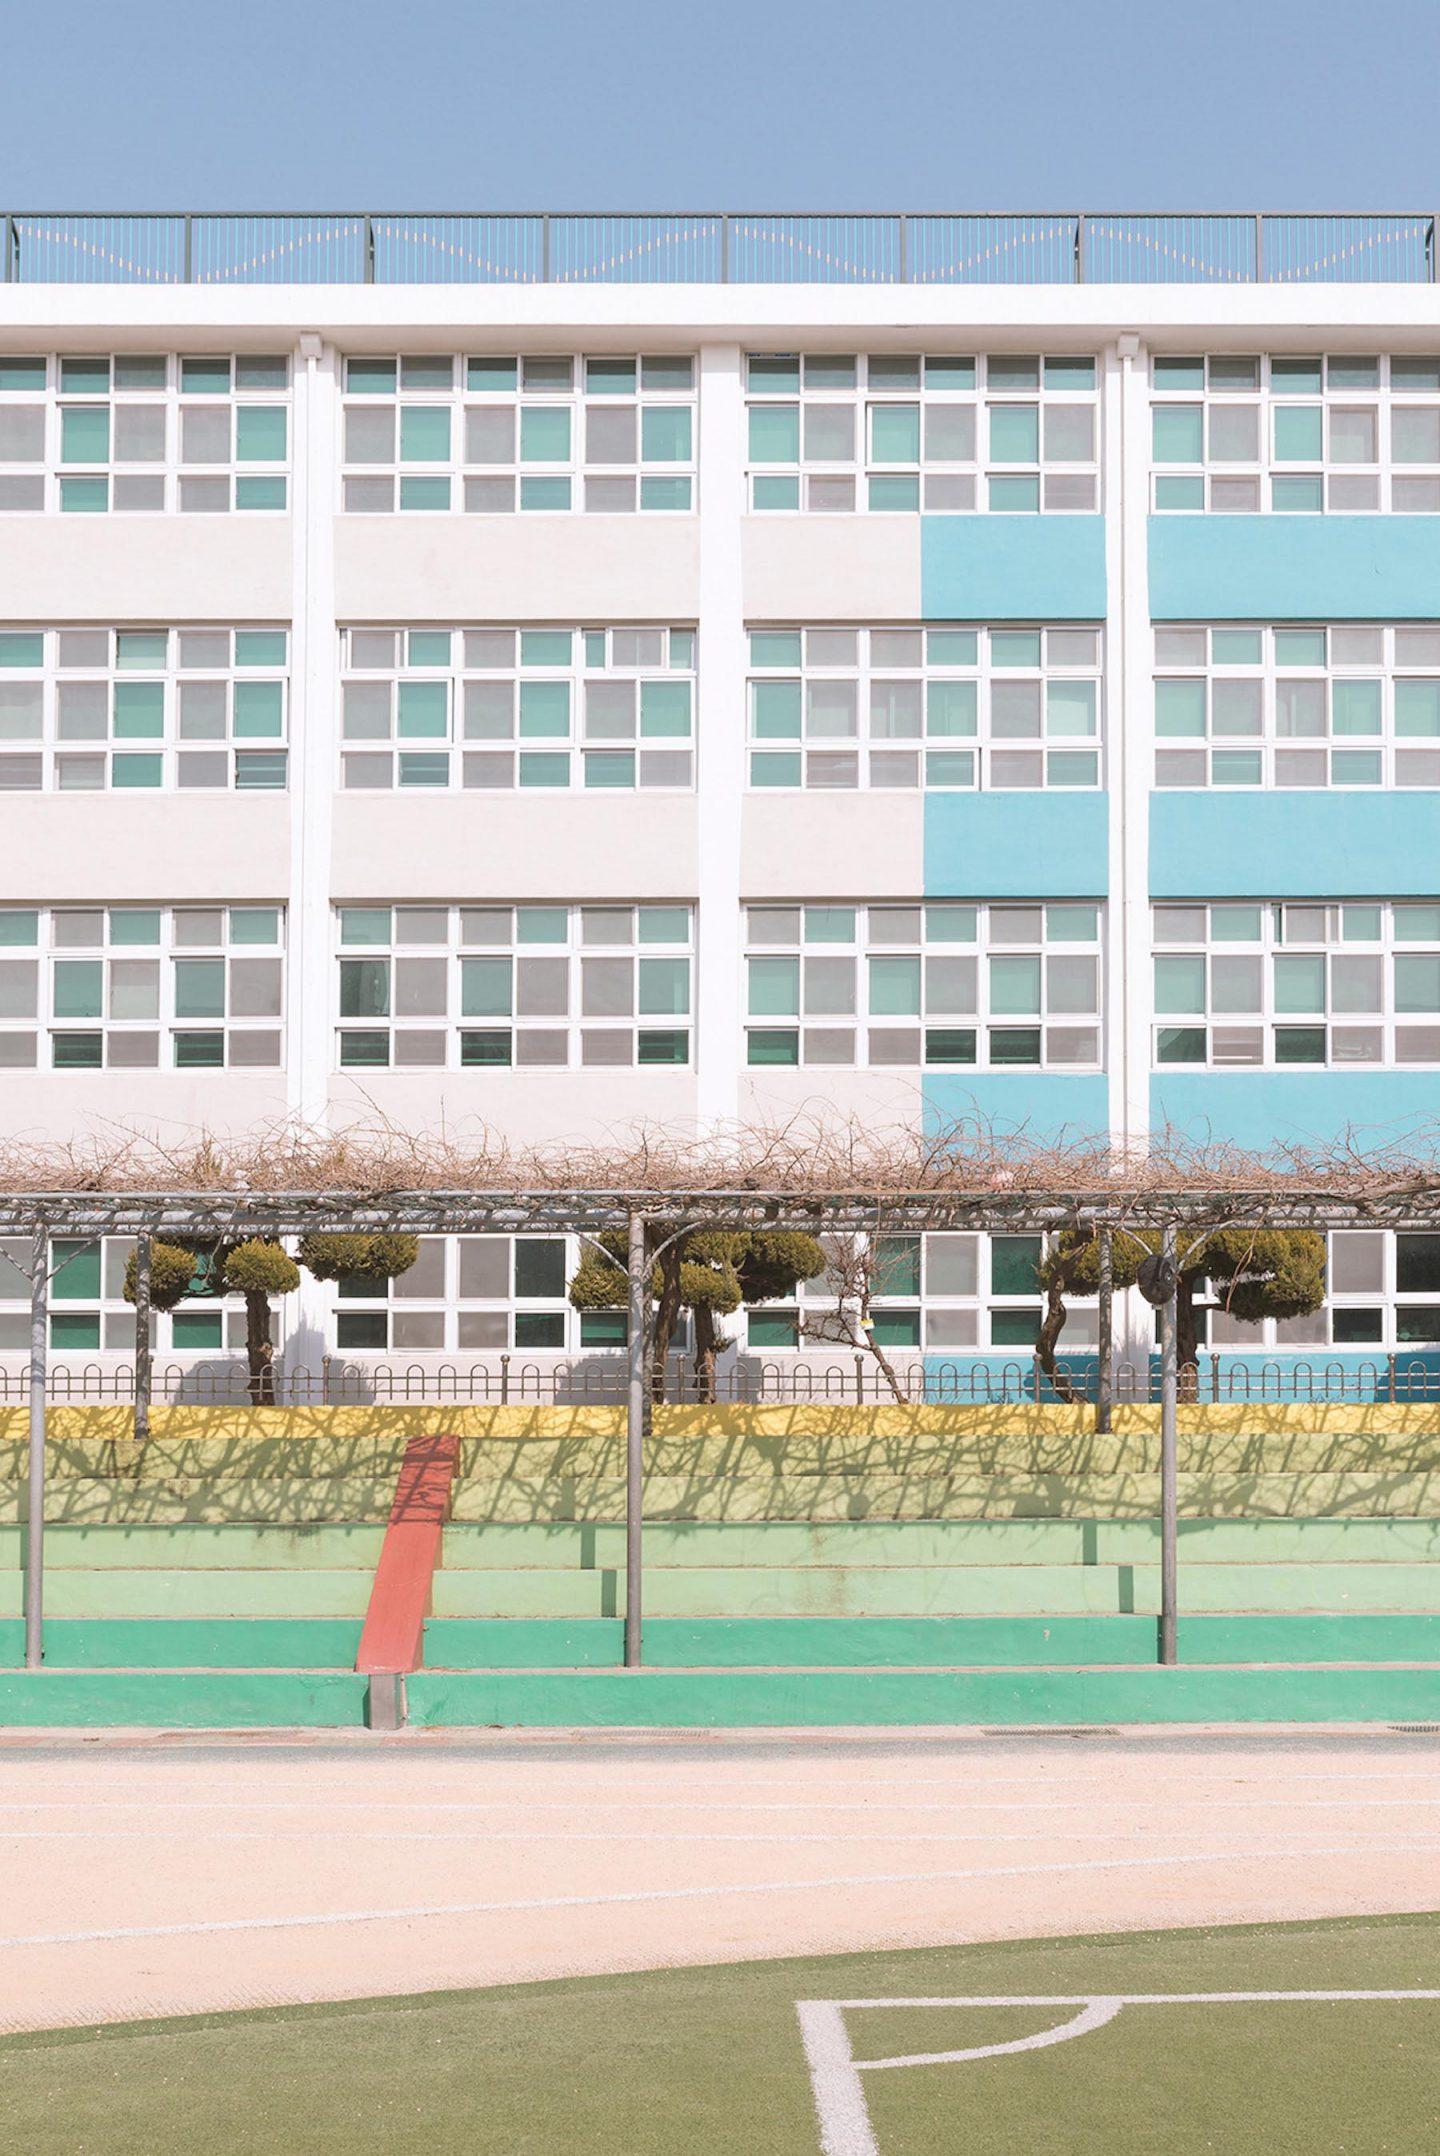 iGNANT-Photography-Andres-Gallardo-Korean-Schooling-04